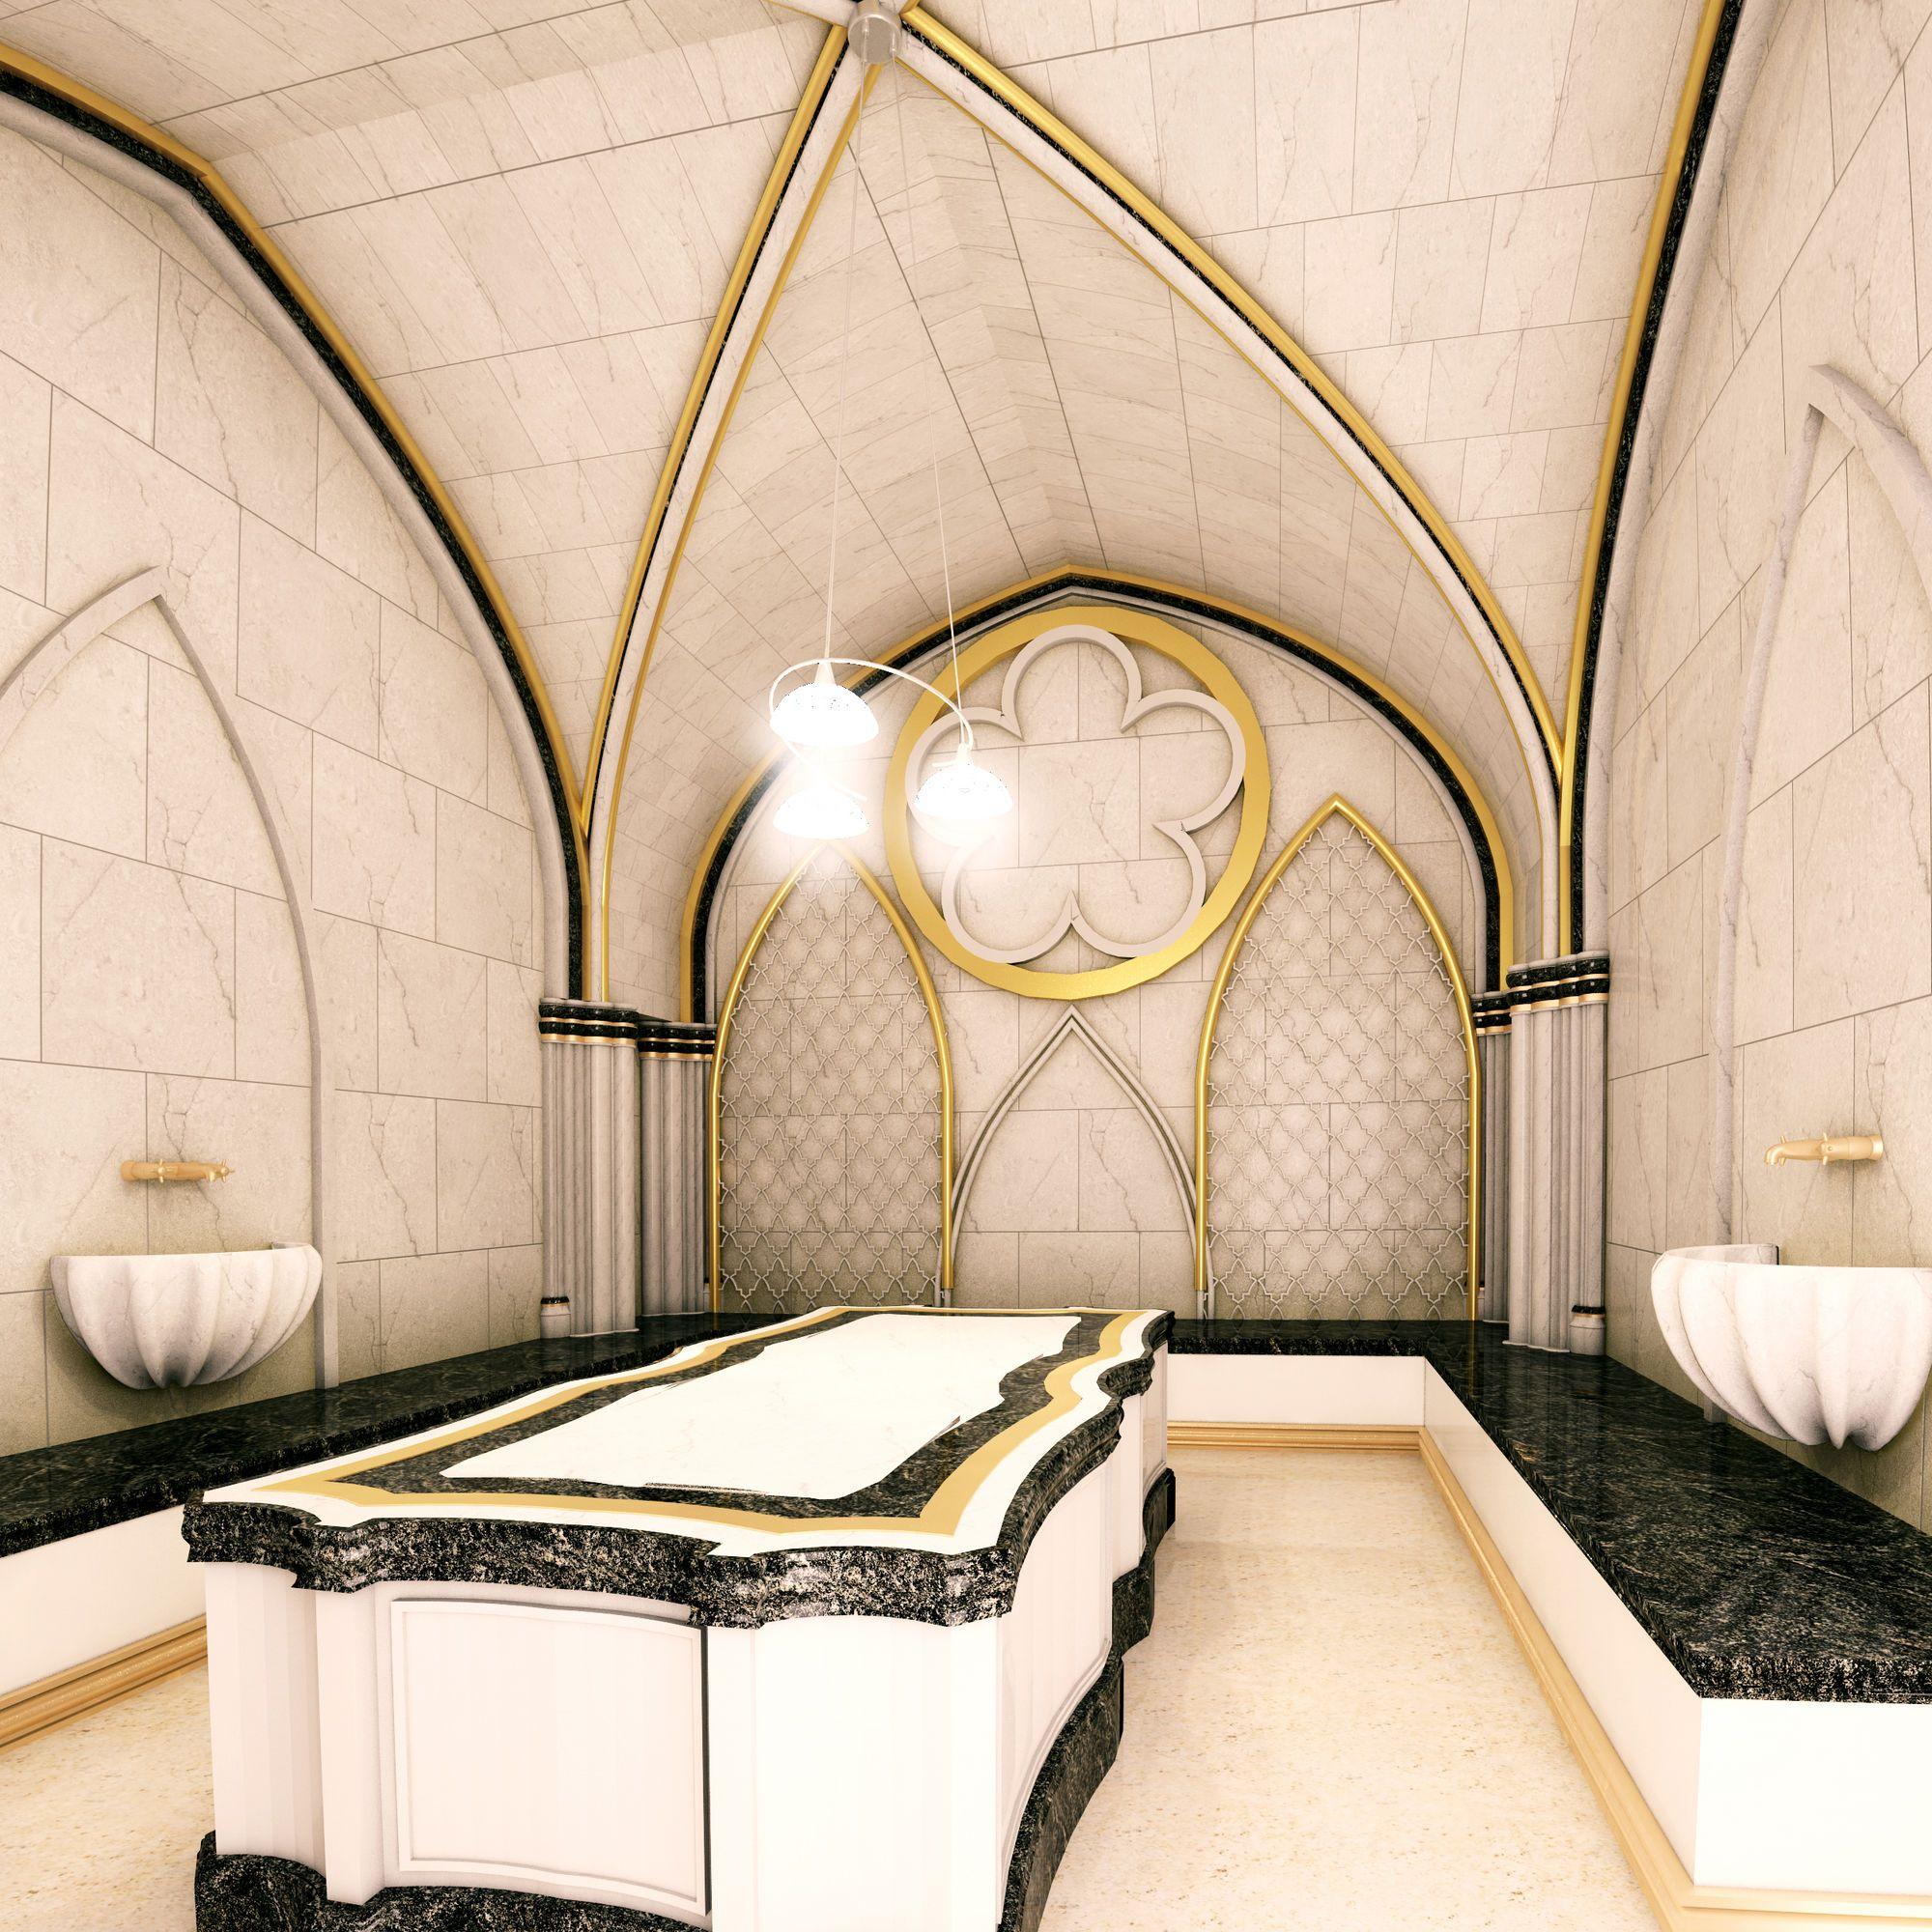 turkish bath design - Google Search | Bath design ...